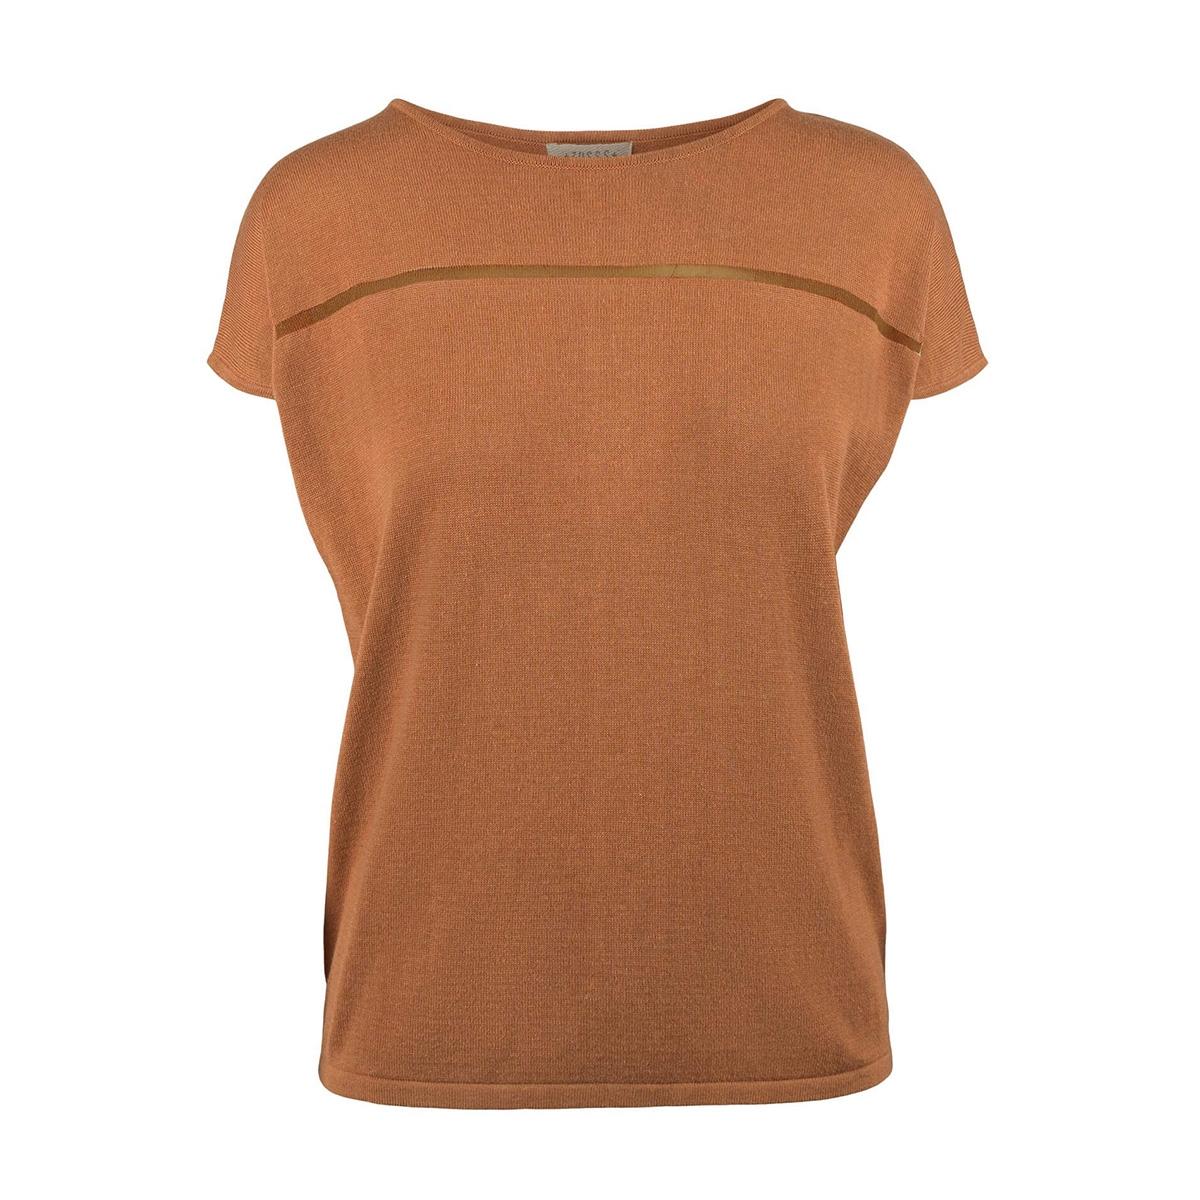 fijngebreide top 0304 006 6506 zusss t-shirt honing